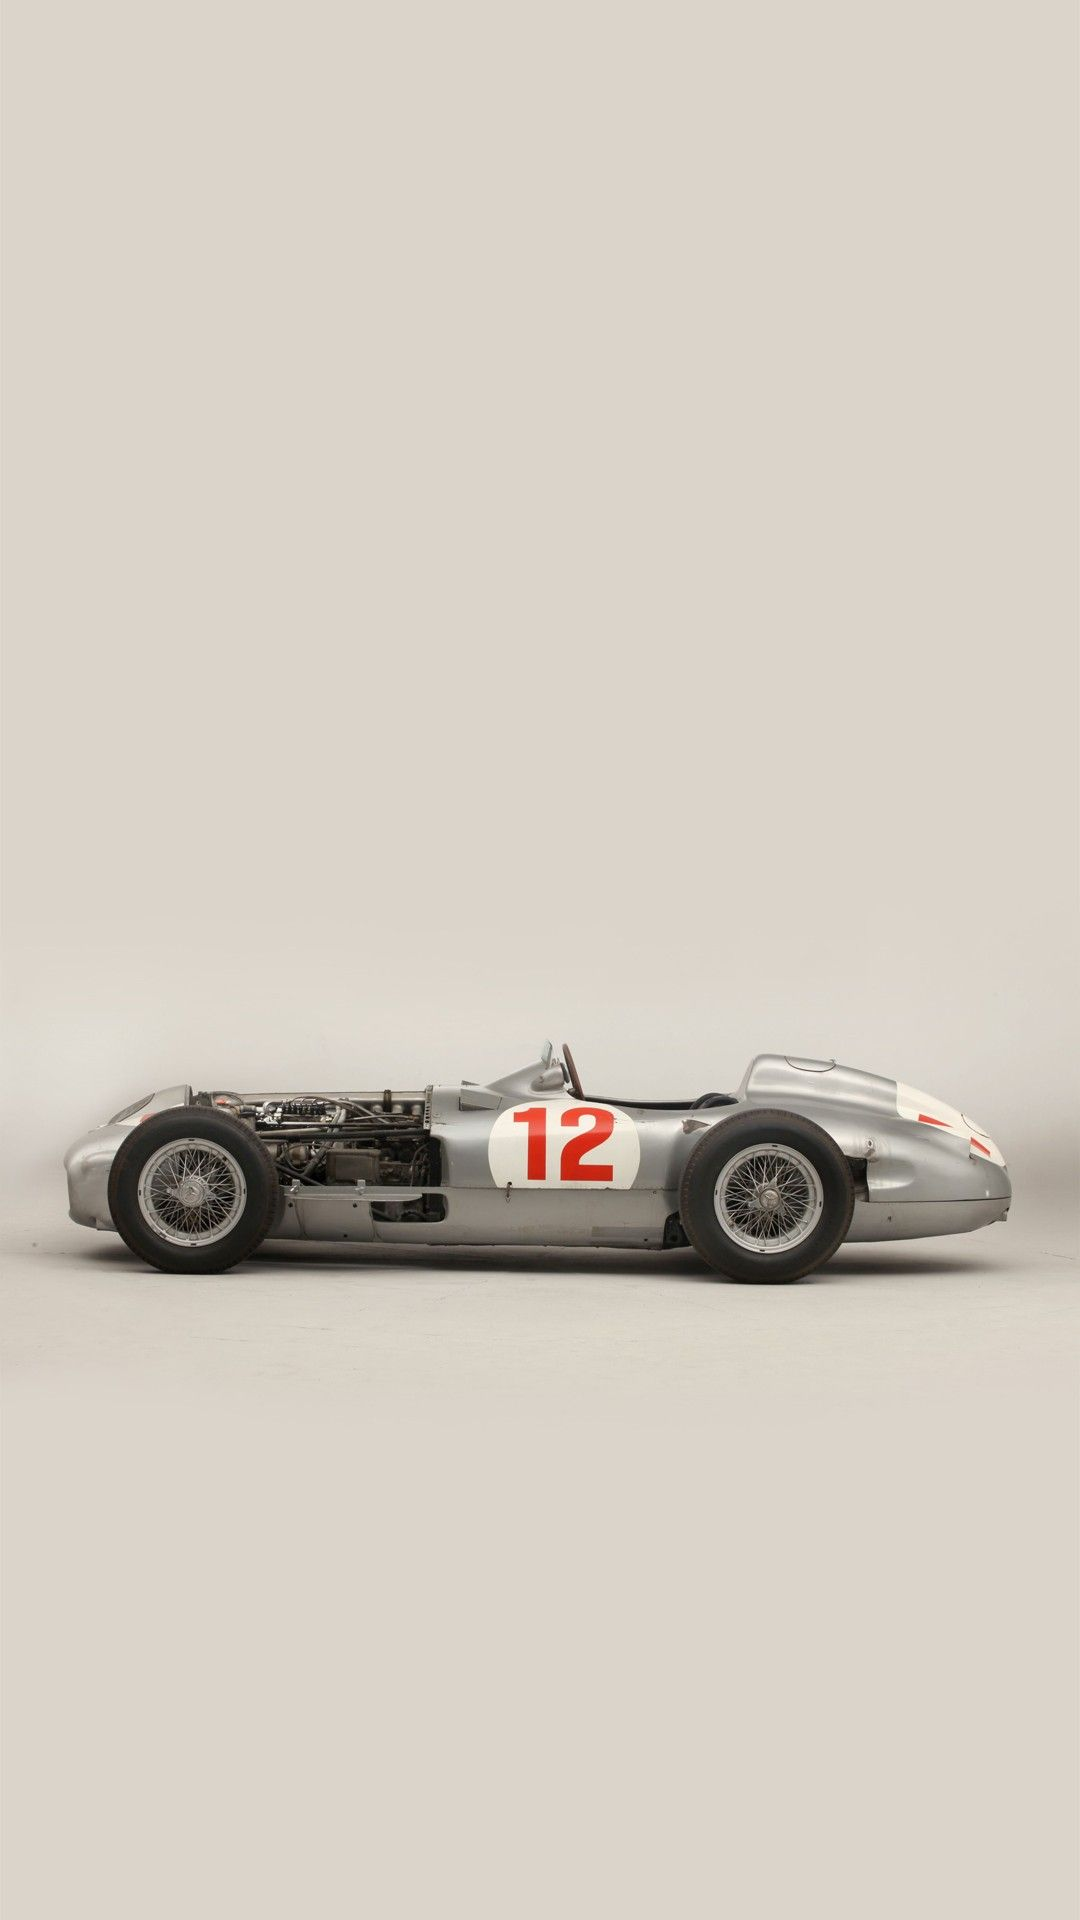 Cars Bikes Iphone 6 Plus Wallpapers 1954 Mercedes Fangio Simple Iphone 6 Plus Hd Wallpaper Mercedes Wallpapers En Hd Autos